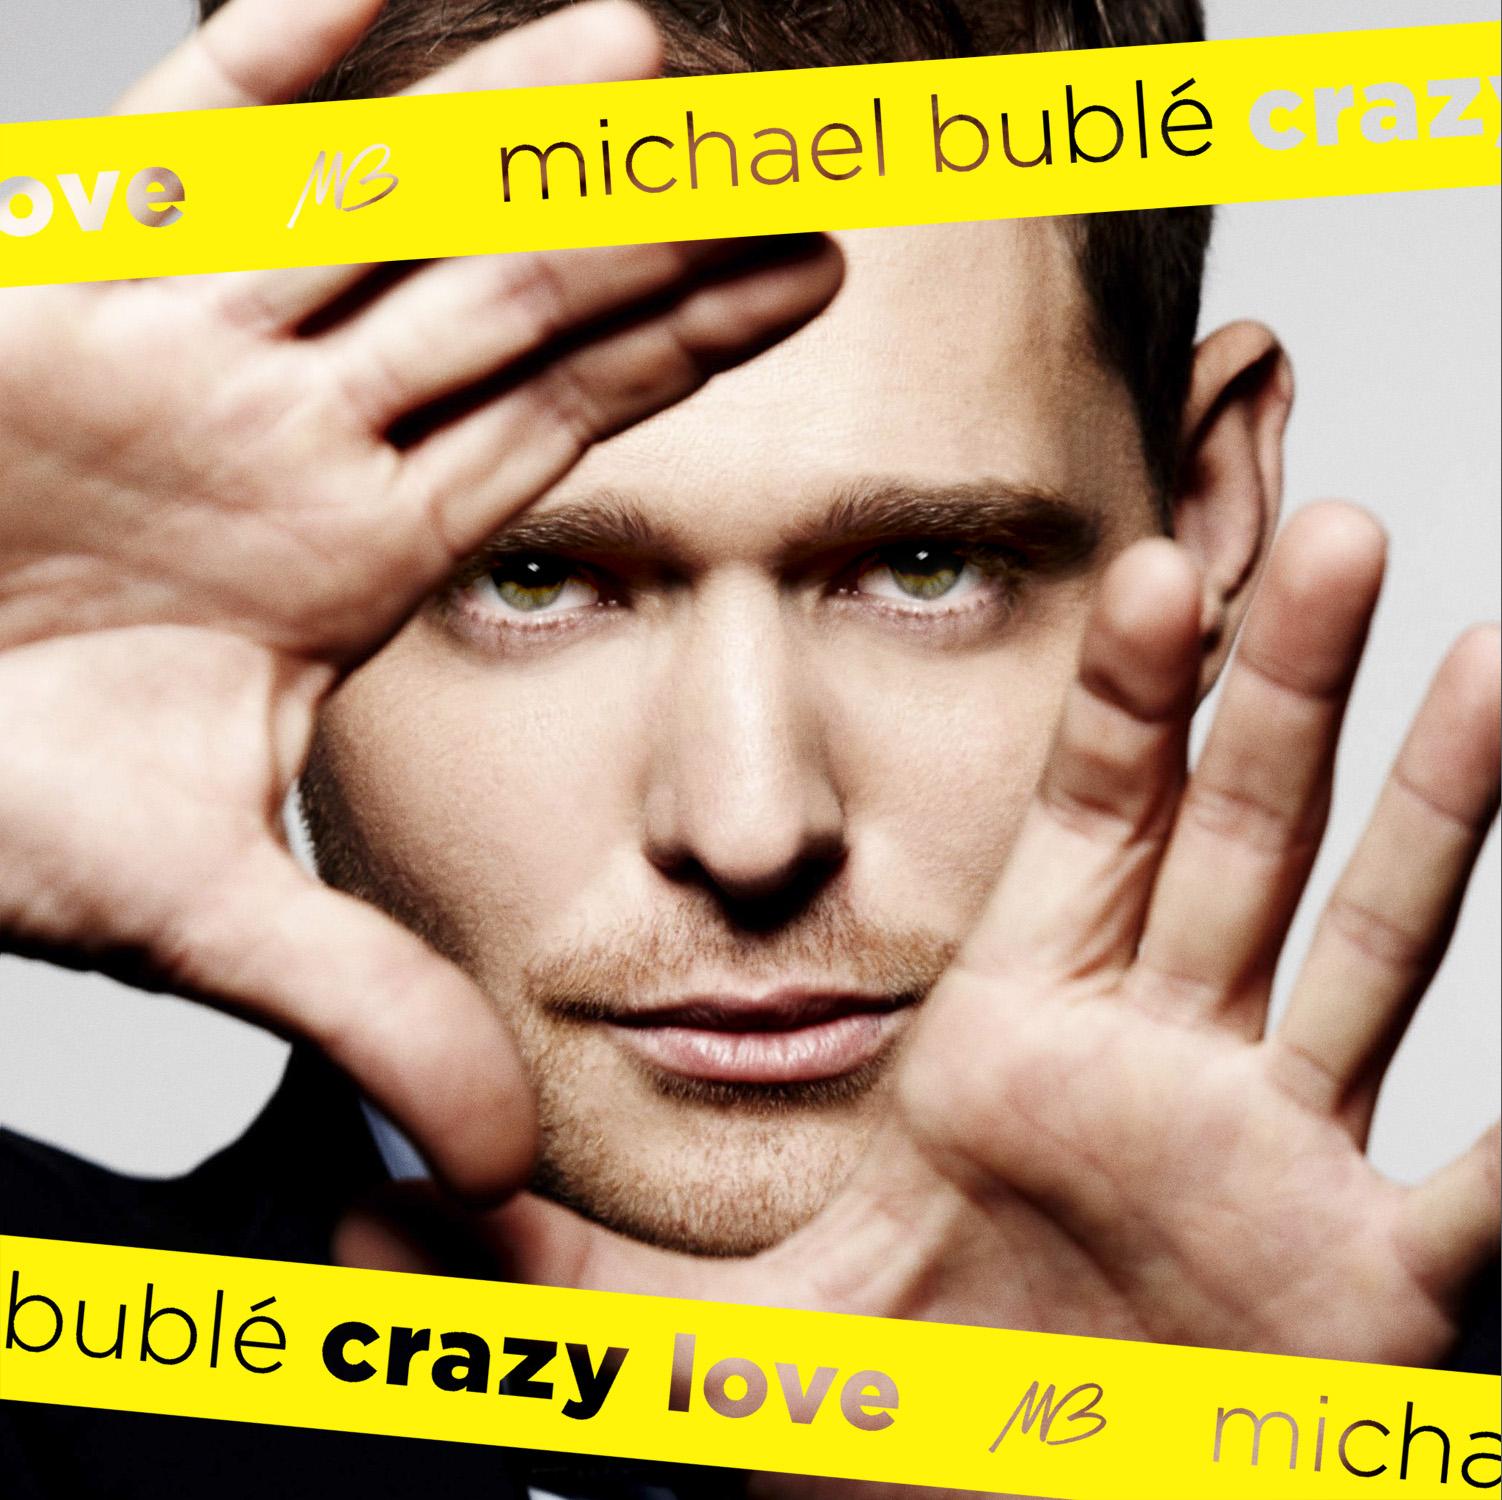 http://1.bp.blogspot.com/_lNClysrwSNU/TDlWlGxpH2I/AAAAAAAACXQ/GMWgu2xxdq4/s1600/michael-buble-2009-cover-album-crazy-love.jpg